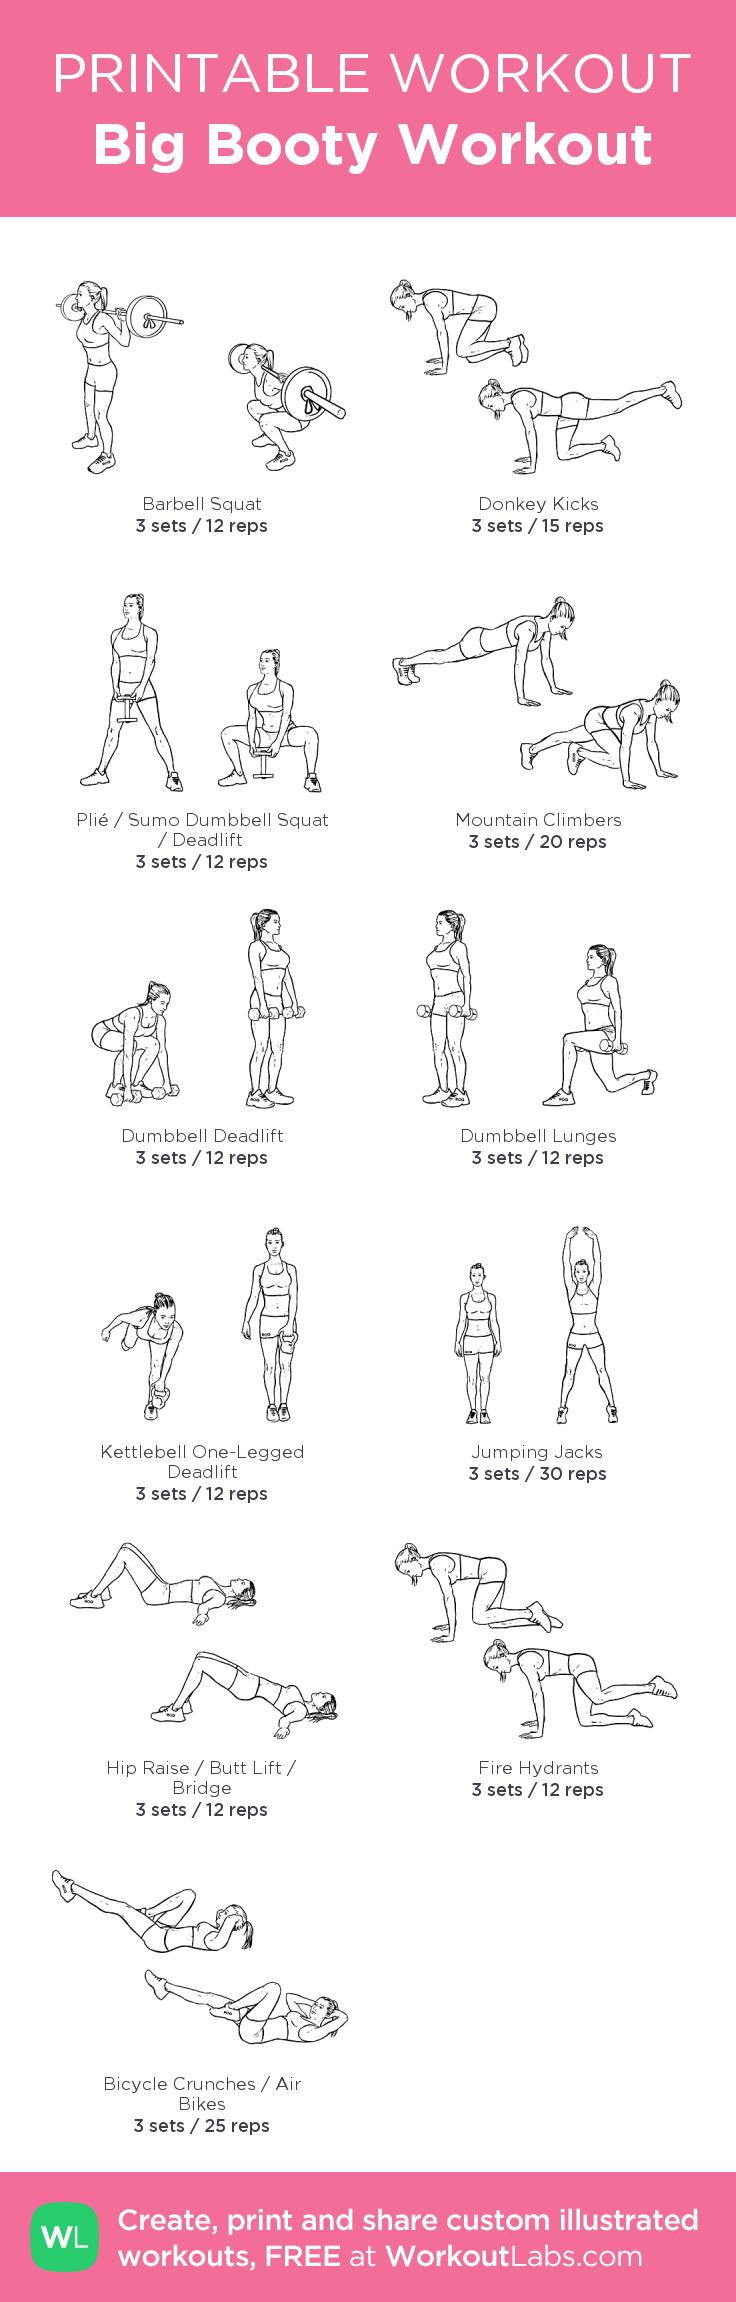 Big Booty Workout: my custom printable workout by @WorkoutLabs #workoutlabs #customworkout